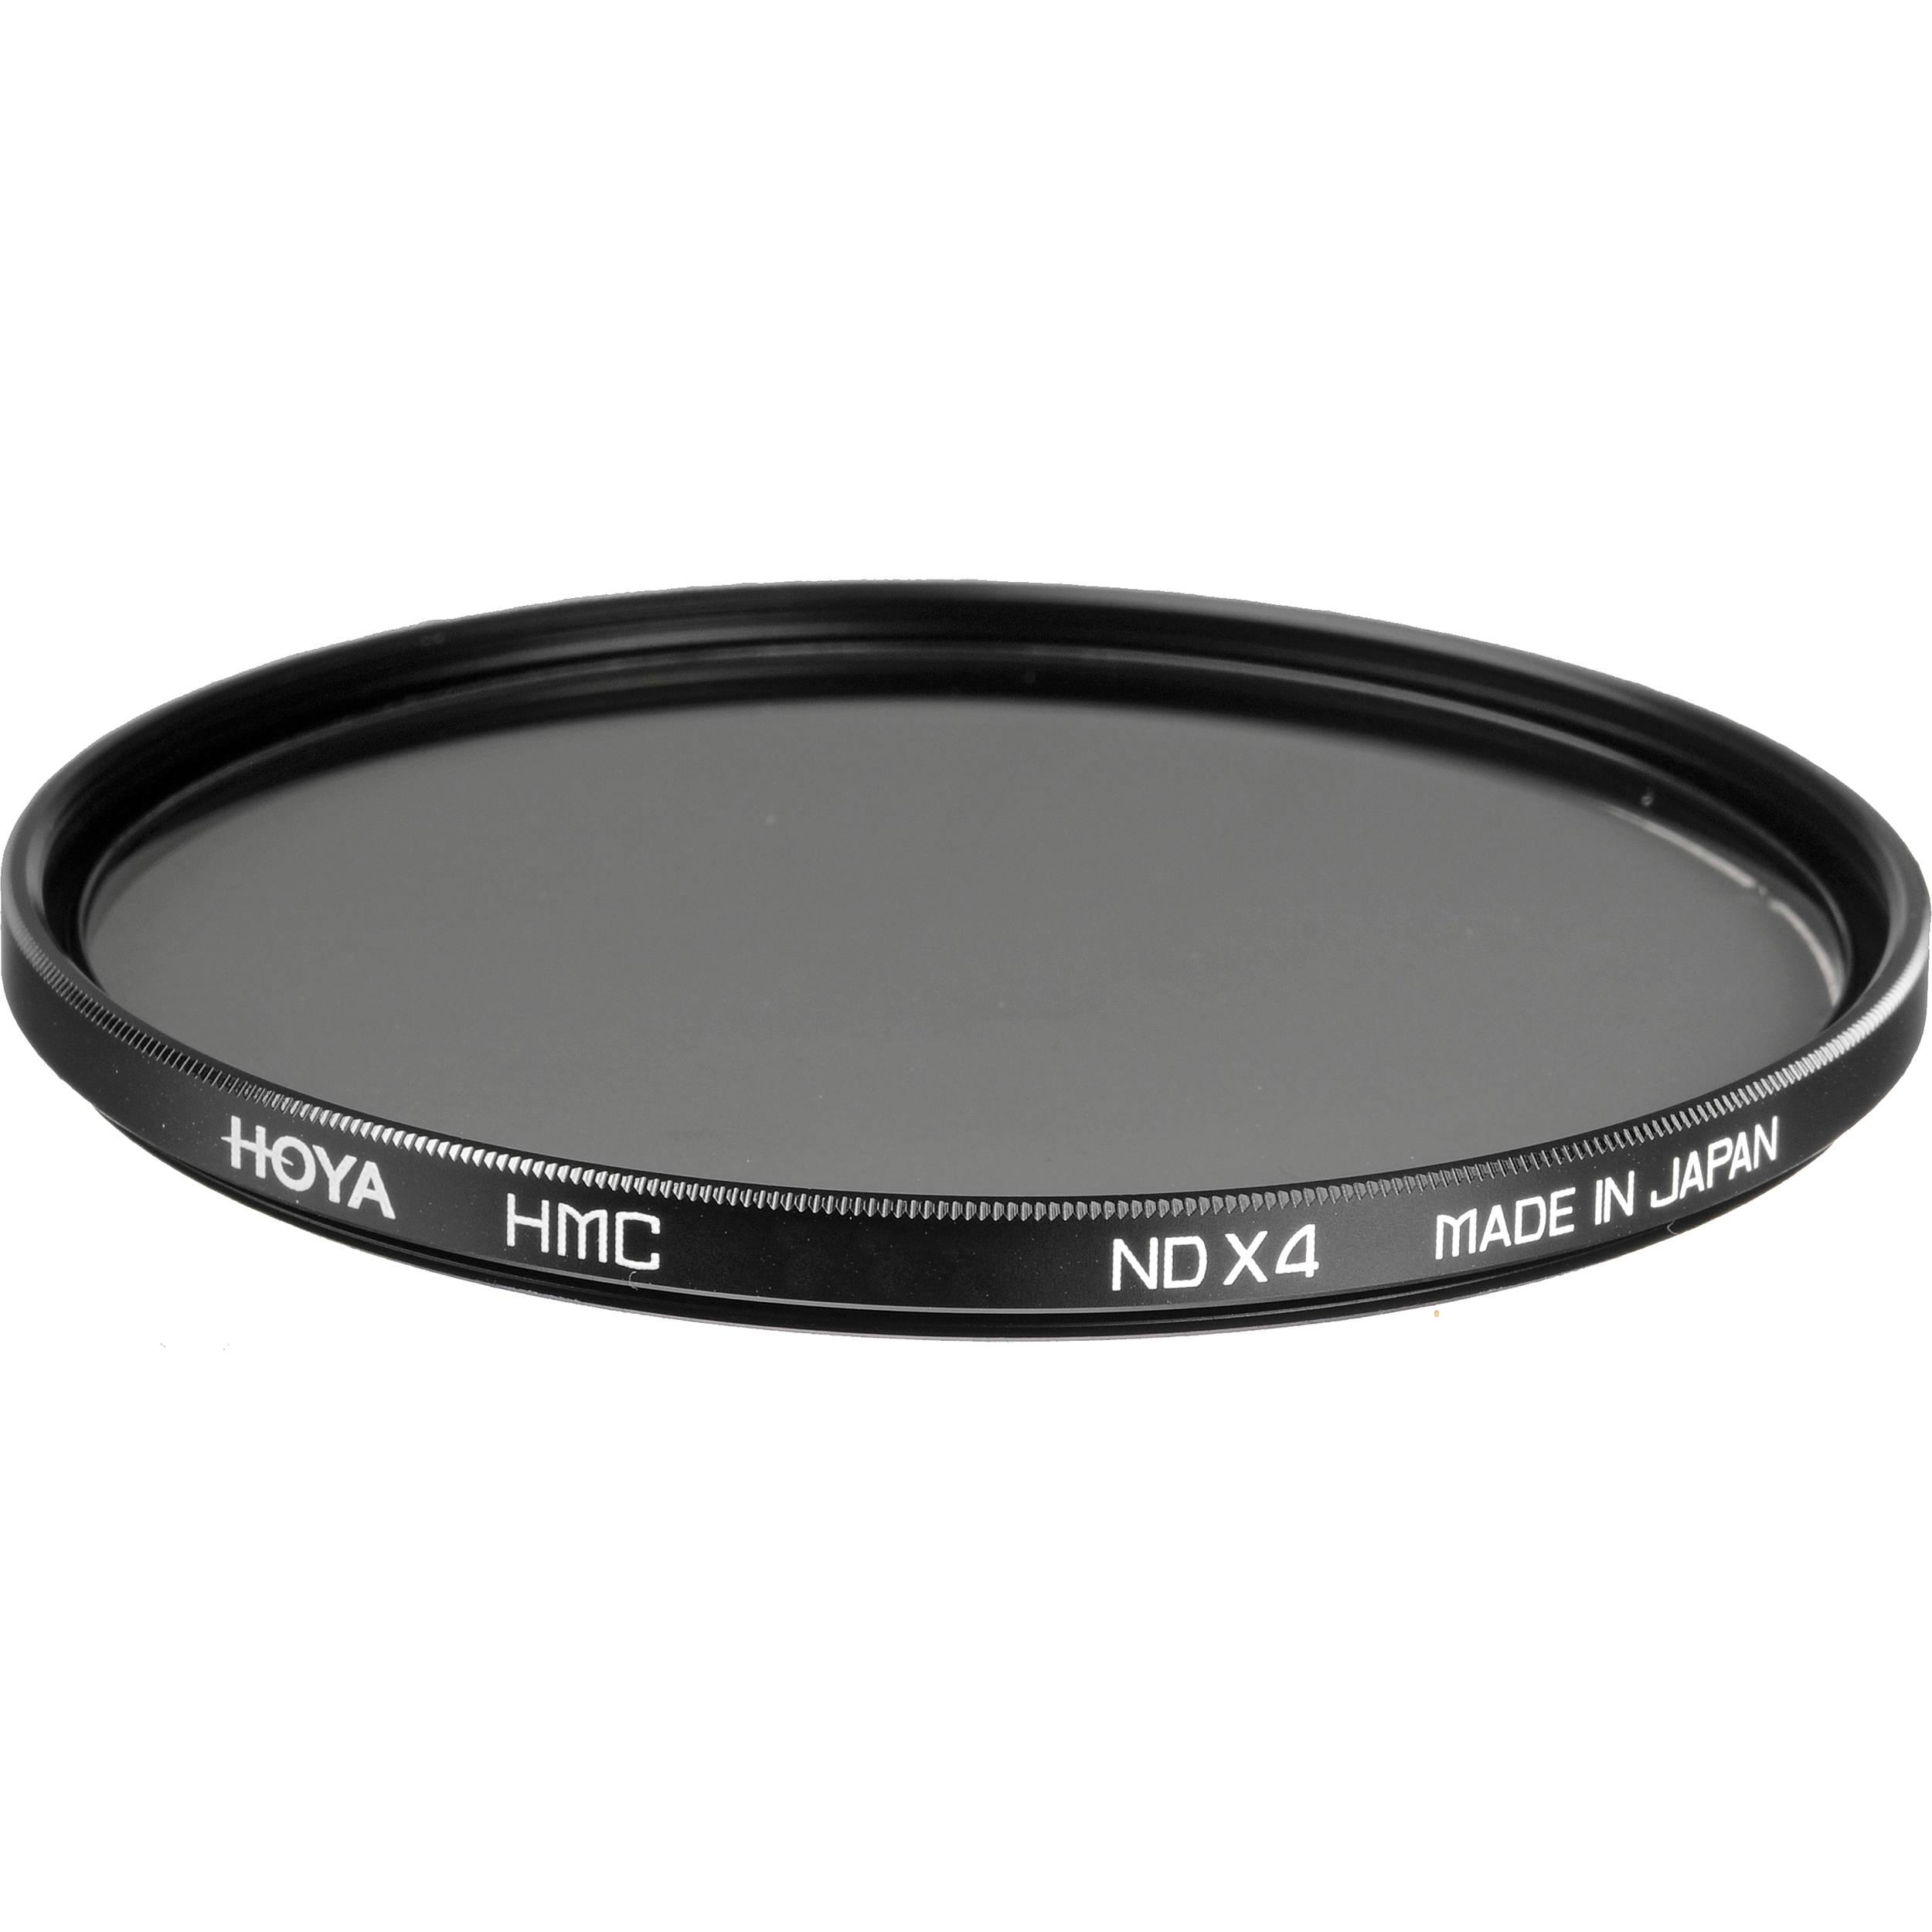 Hoya 67mm HMC Neutral Density NDX4 Multi-Coated 0.6 Filter